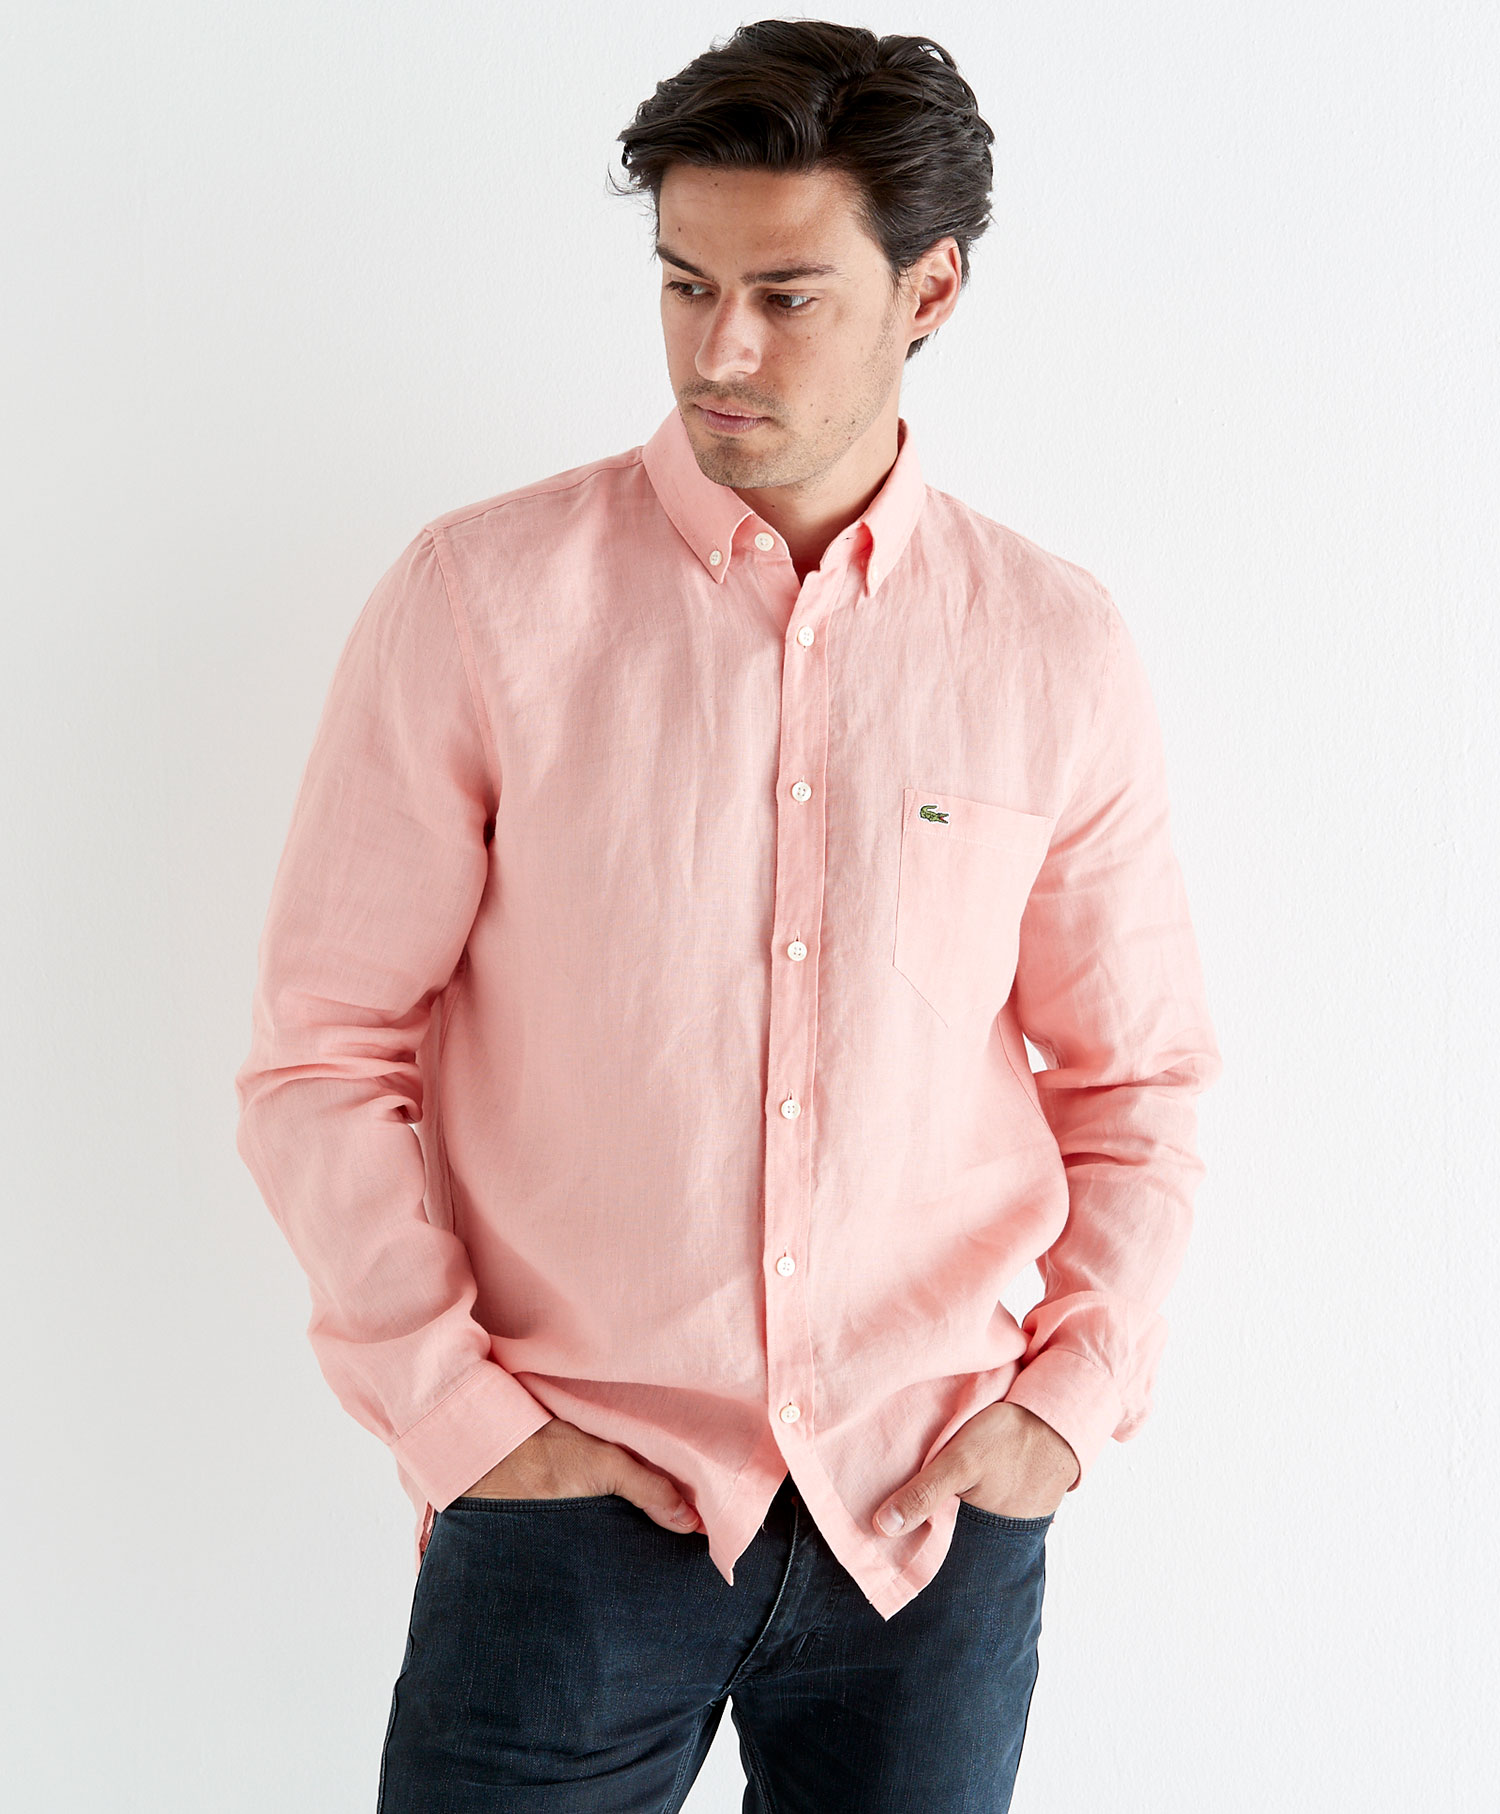 Lacoste lin skjorte